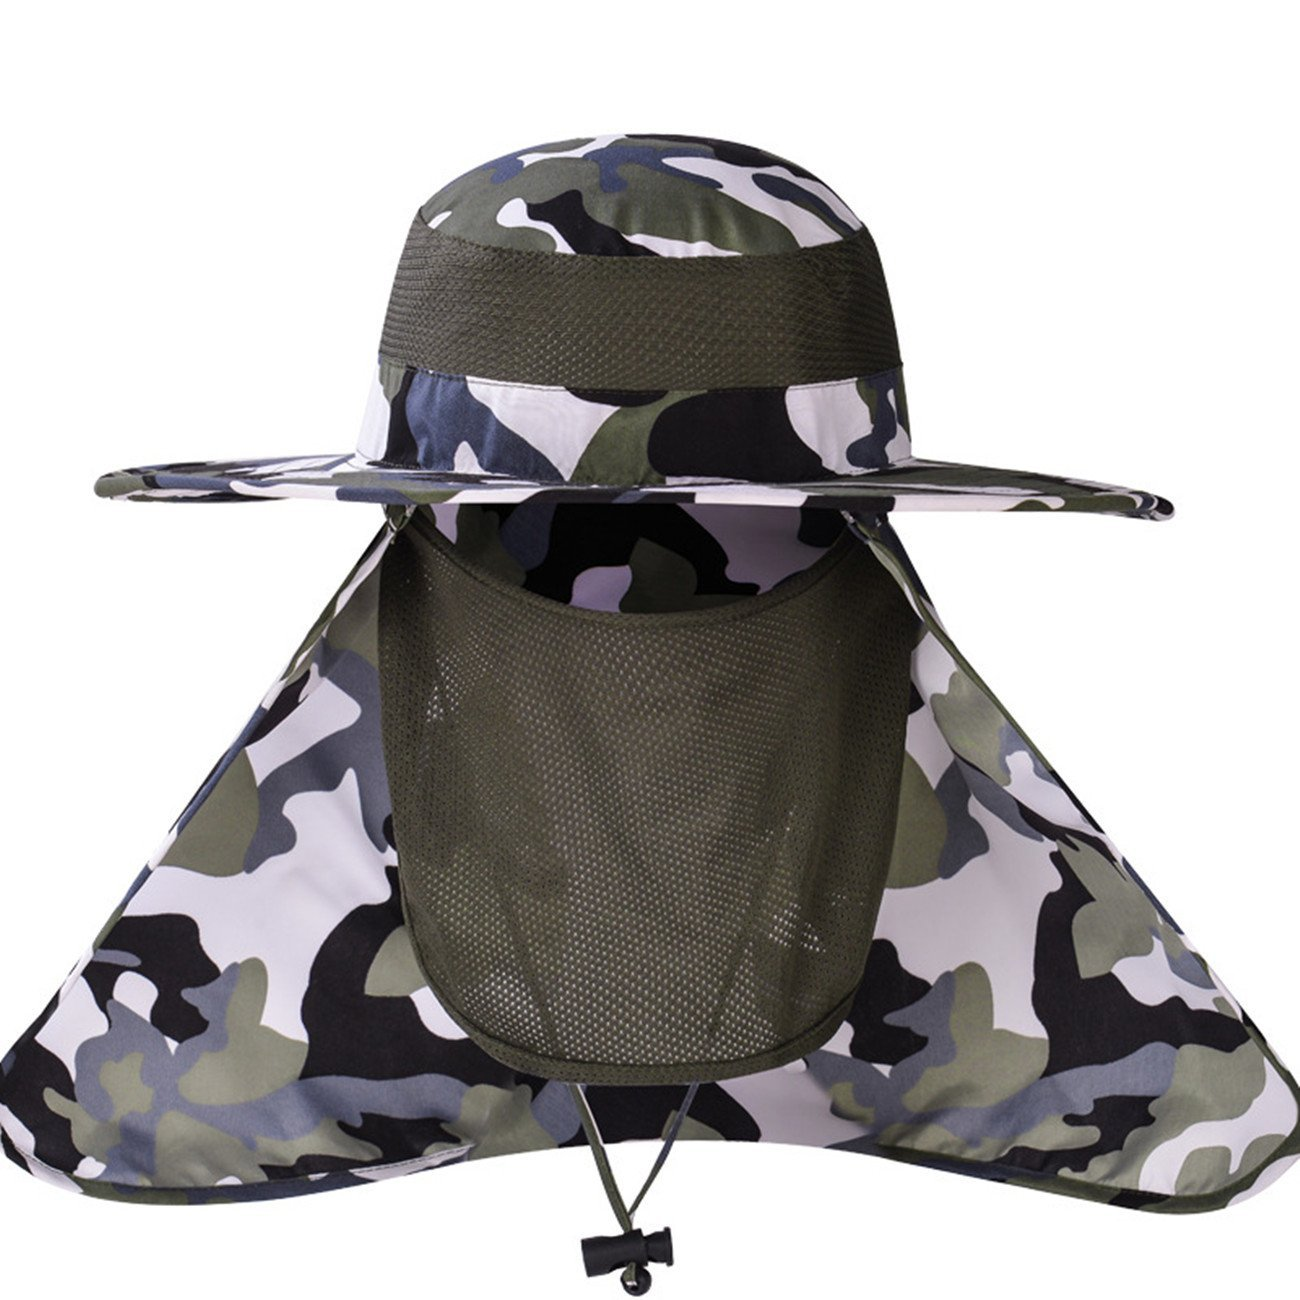 c70e8487 Get Quotations · Unisex Sun Hats UV Protection , Summer Hiking Safari Hat  Wide Brim Sun Visor Hat UPF